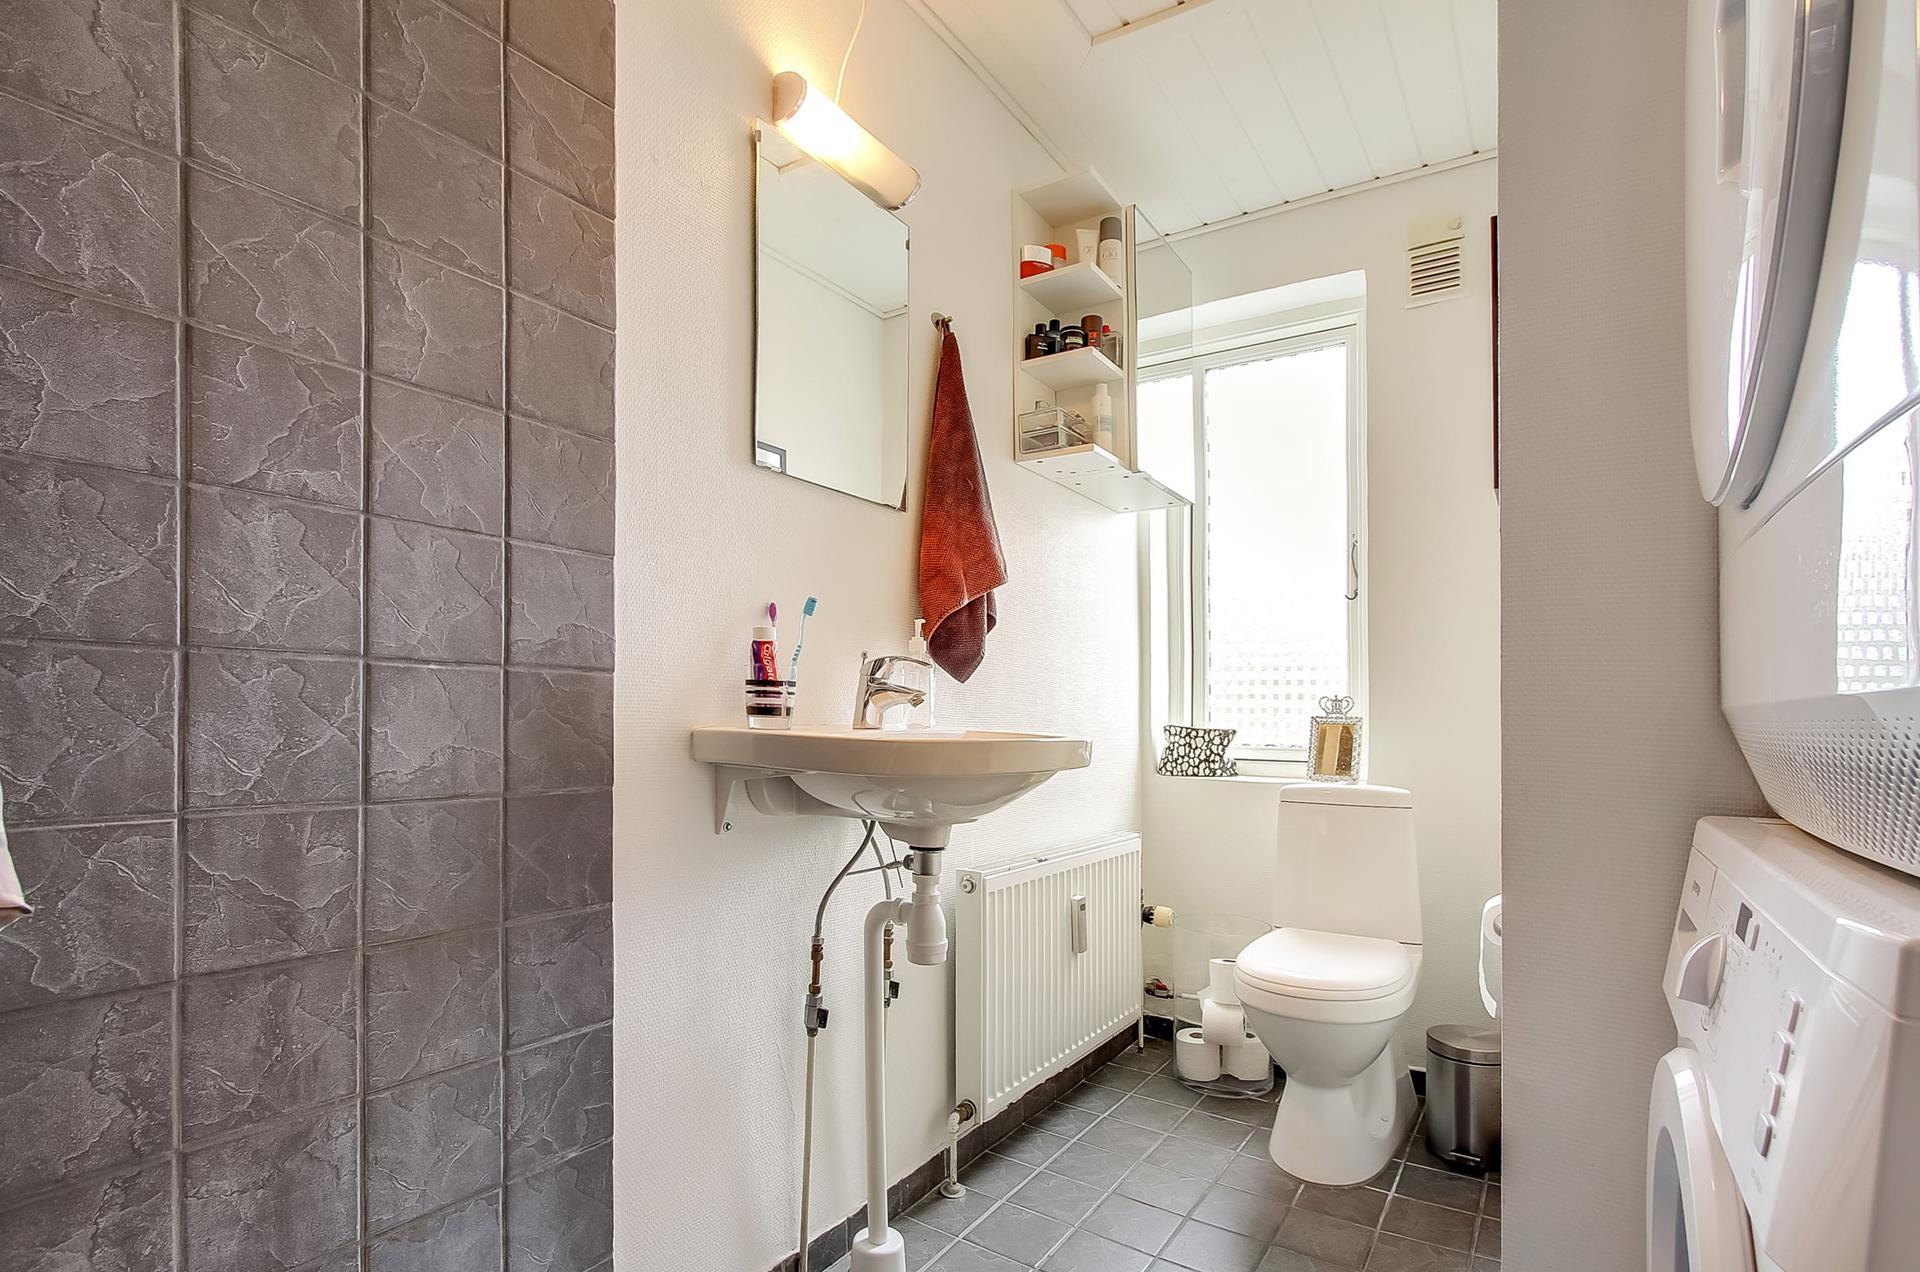 Boligudlejning på Oddervej i Højbjerg - Toilet